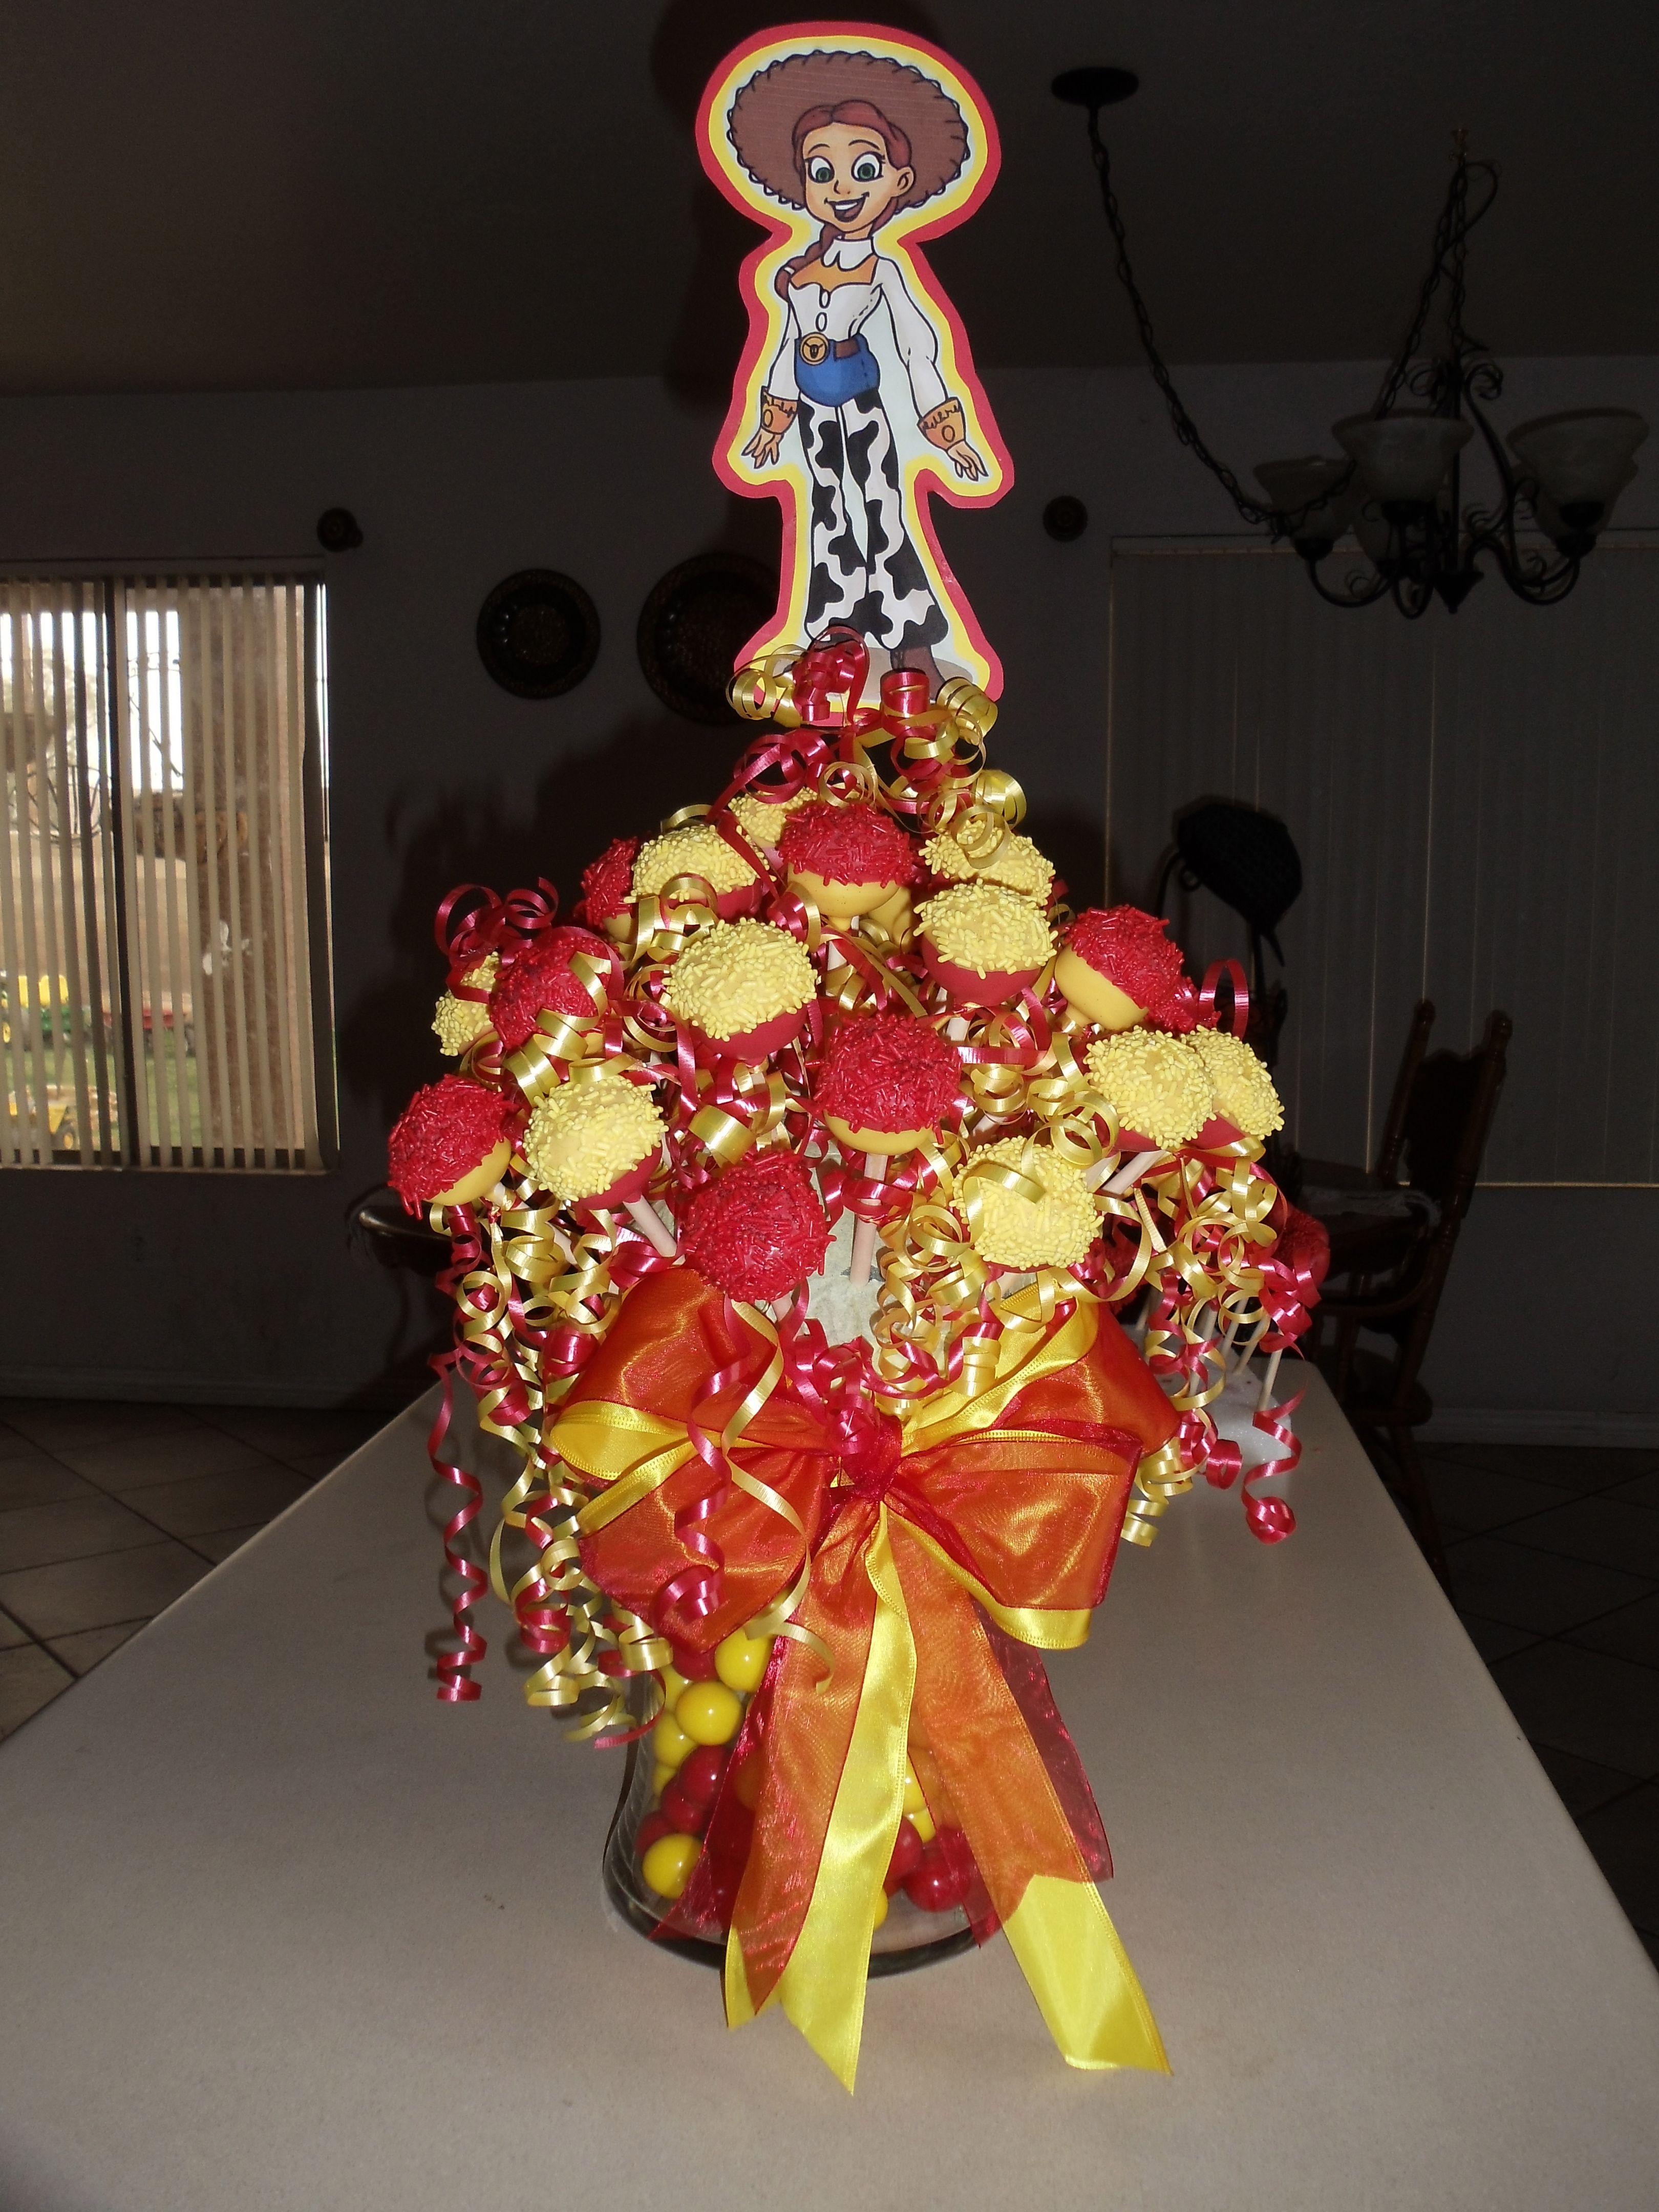 Toy Storys Jesse Cake Pop Bouquet #cakepopbouquet